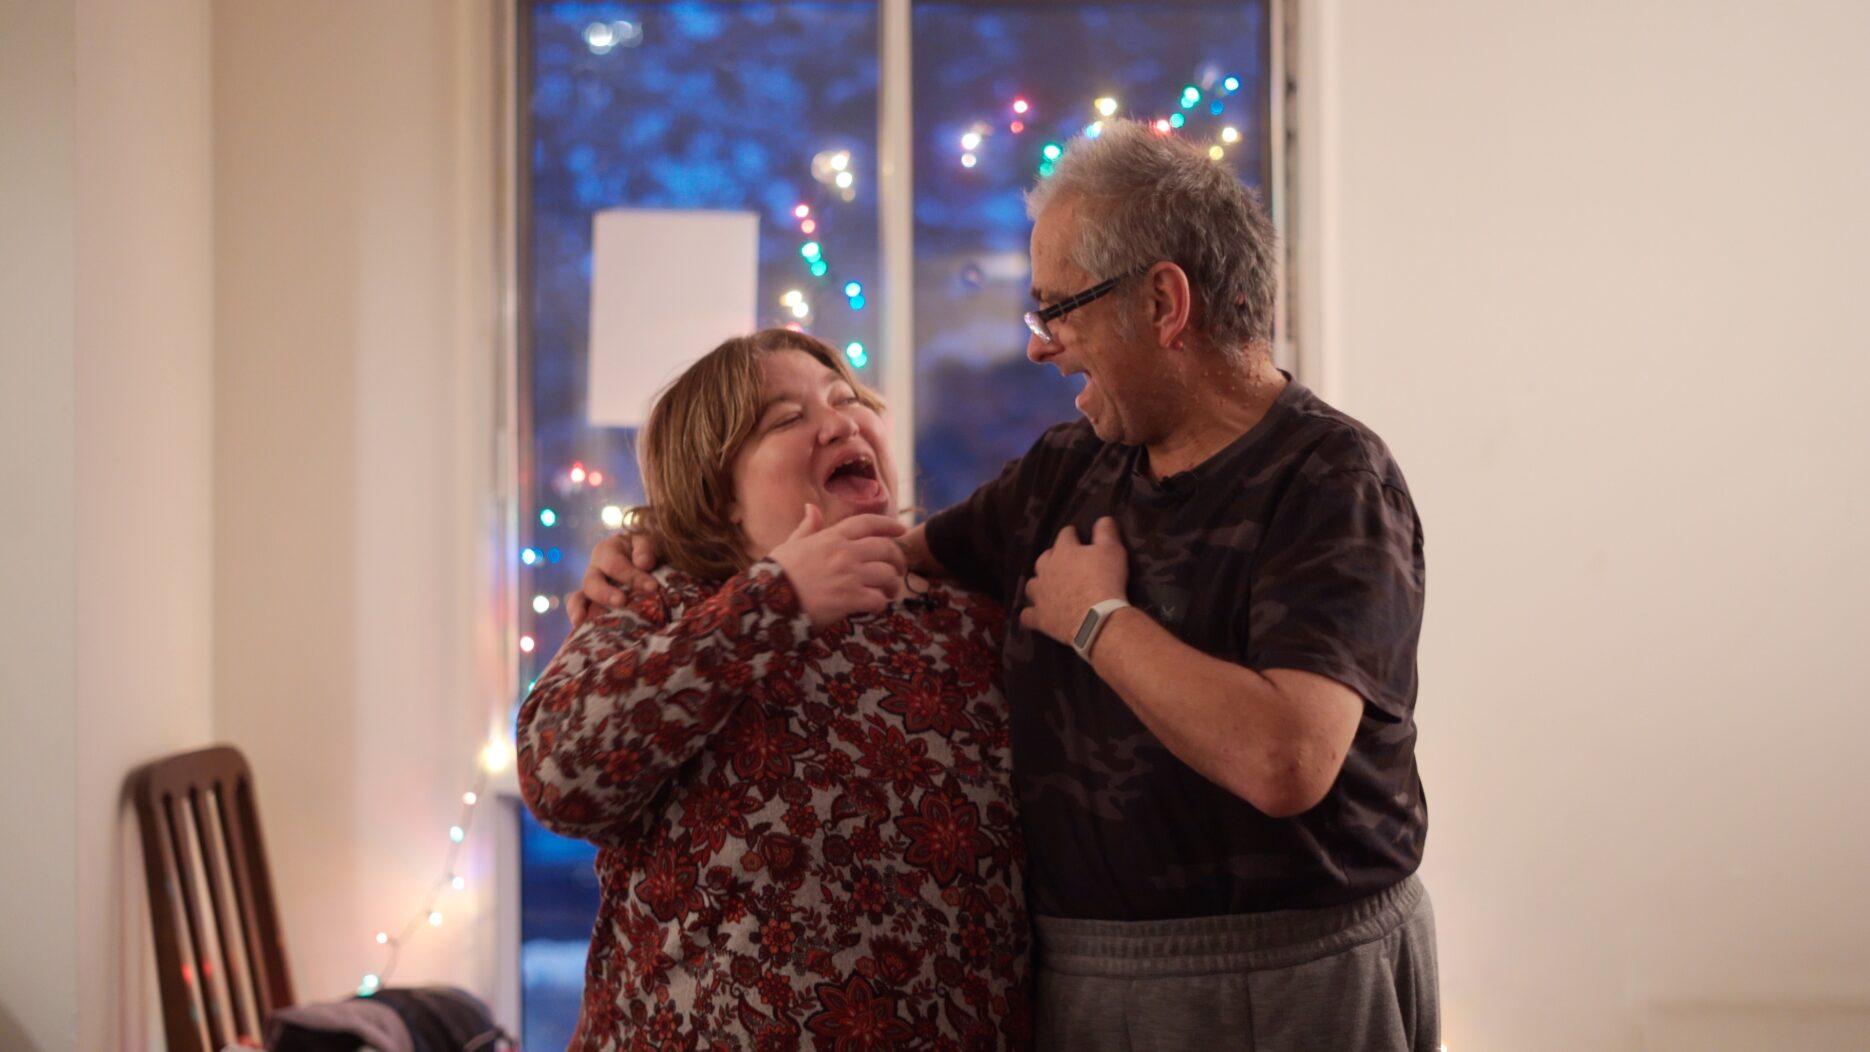 Middle Aged Couple Singing